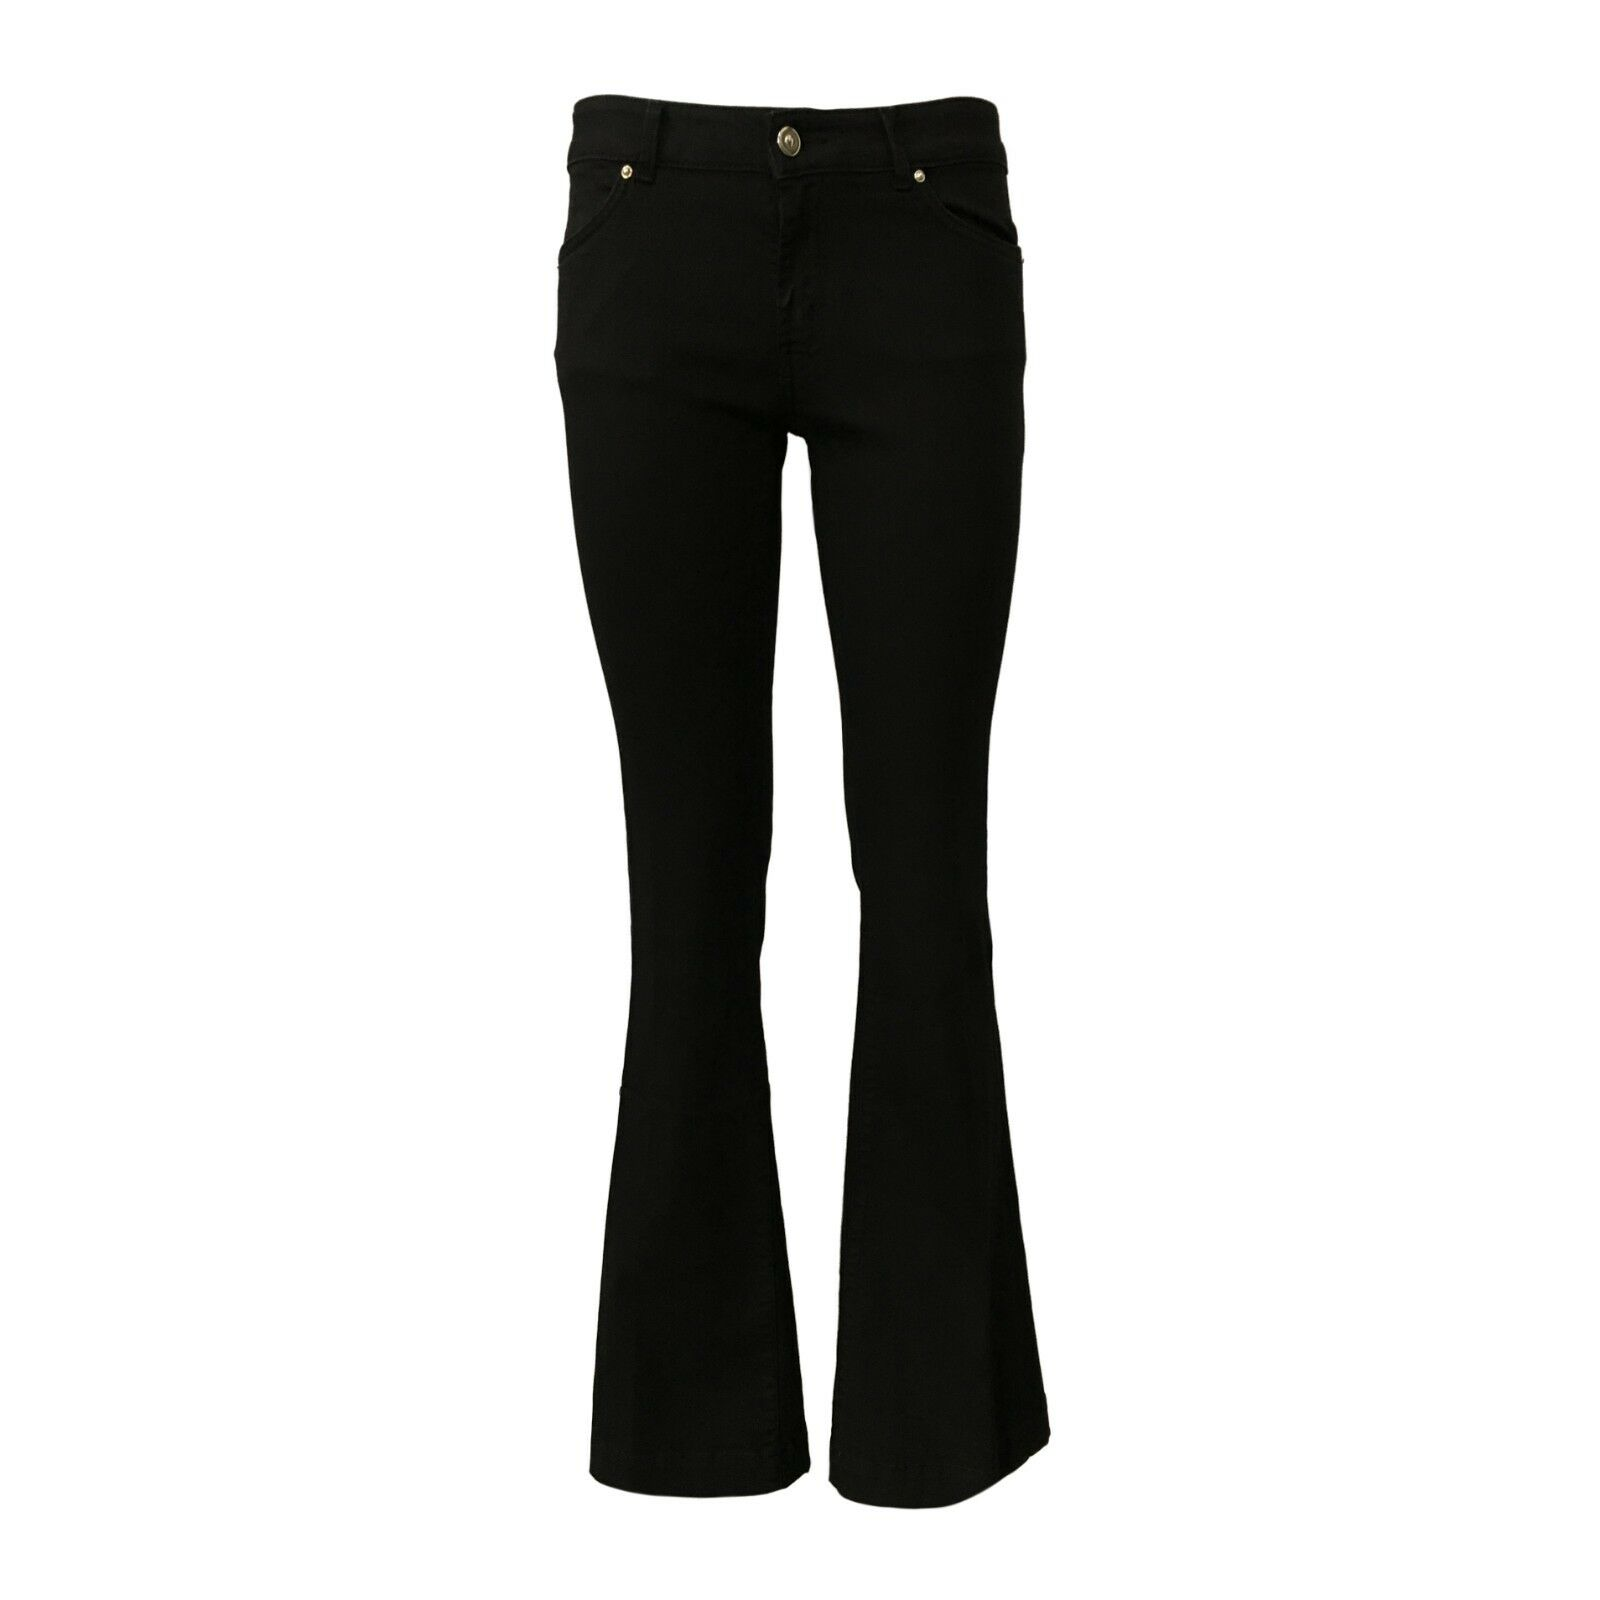 d5bcf798496f 7.24 jeans donna nero zampa con zip mod EVELYN MADE IN ITALY regolare vita  nvxugw3536-Jeans